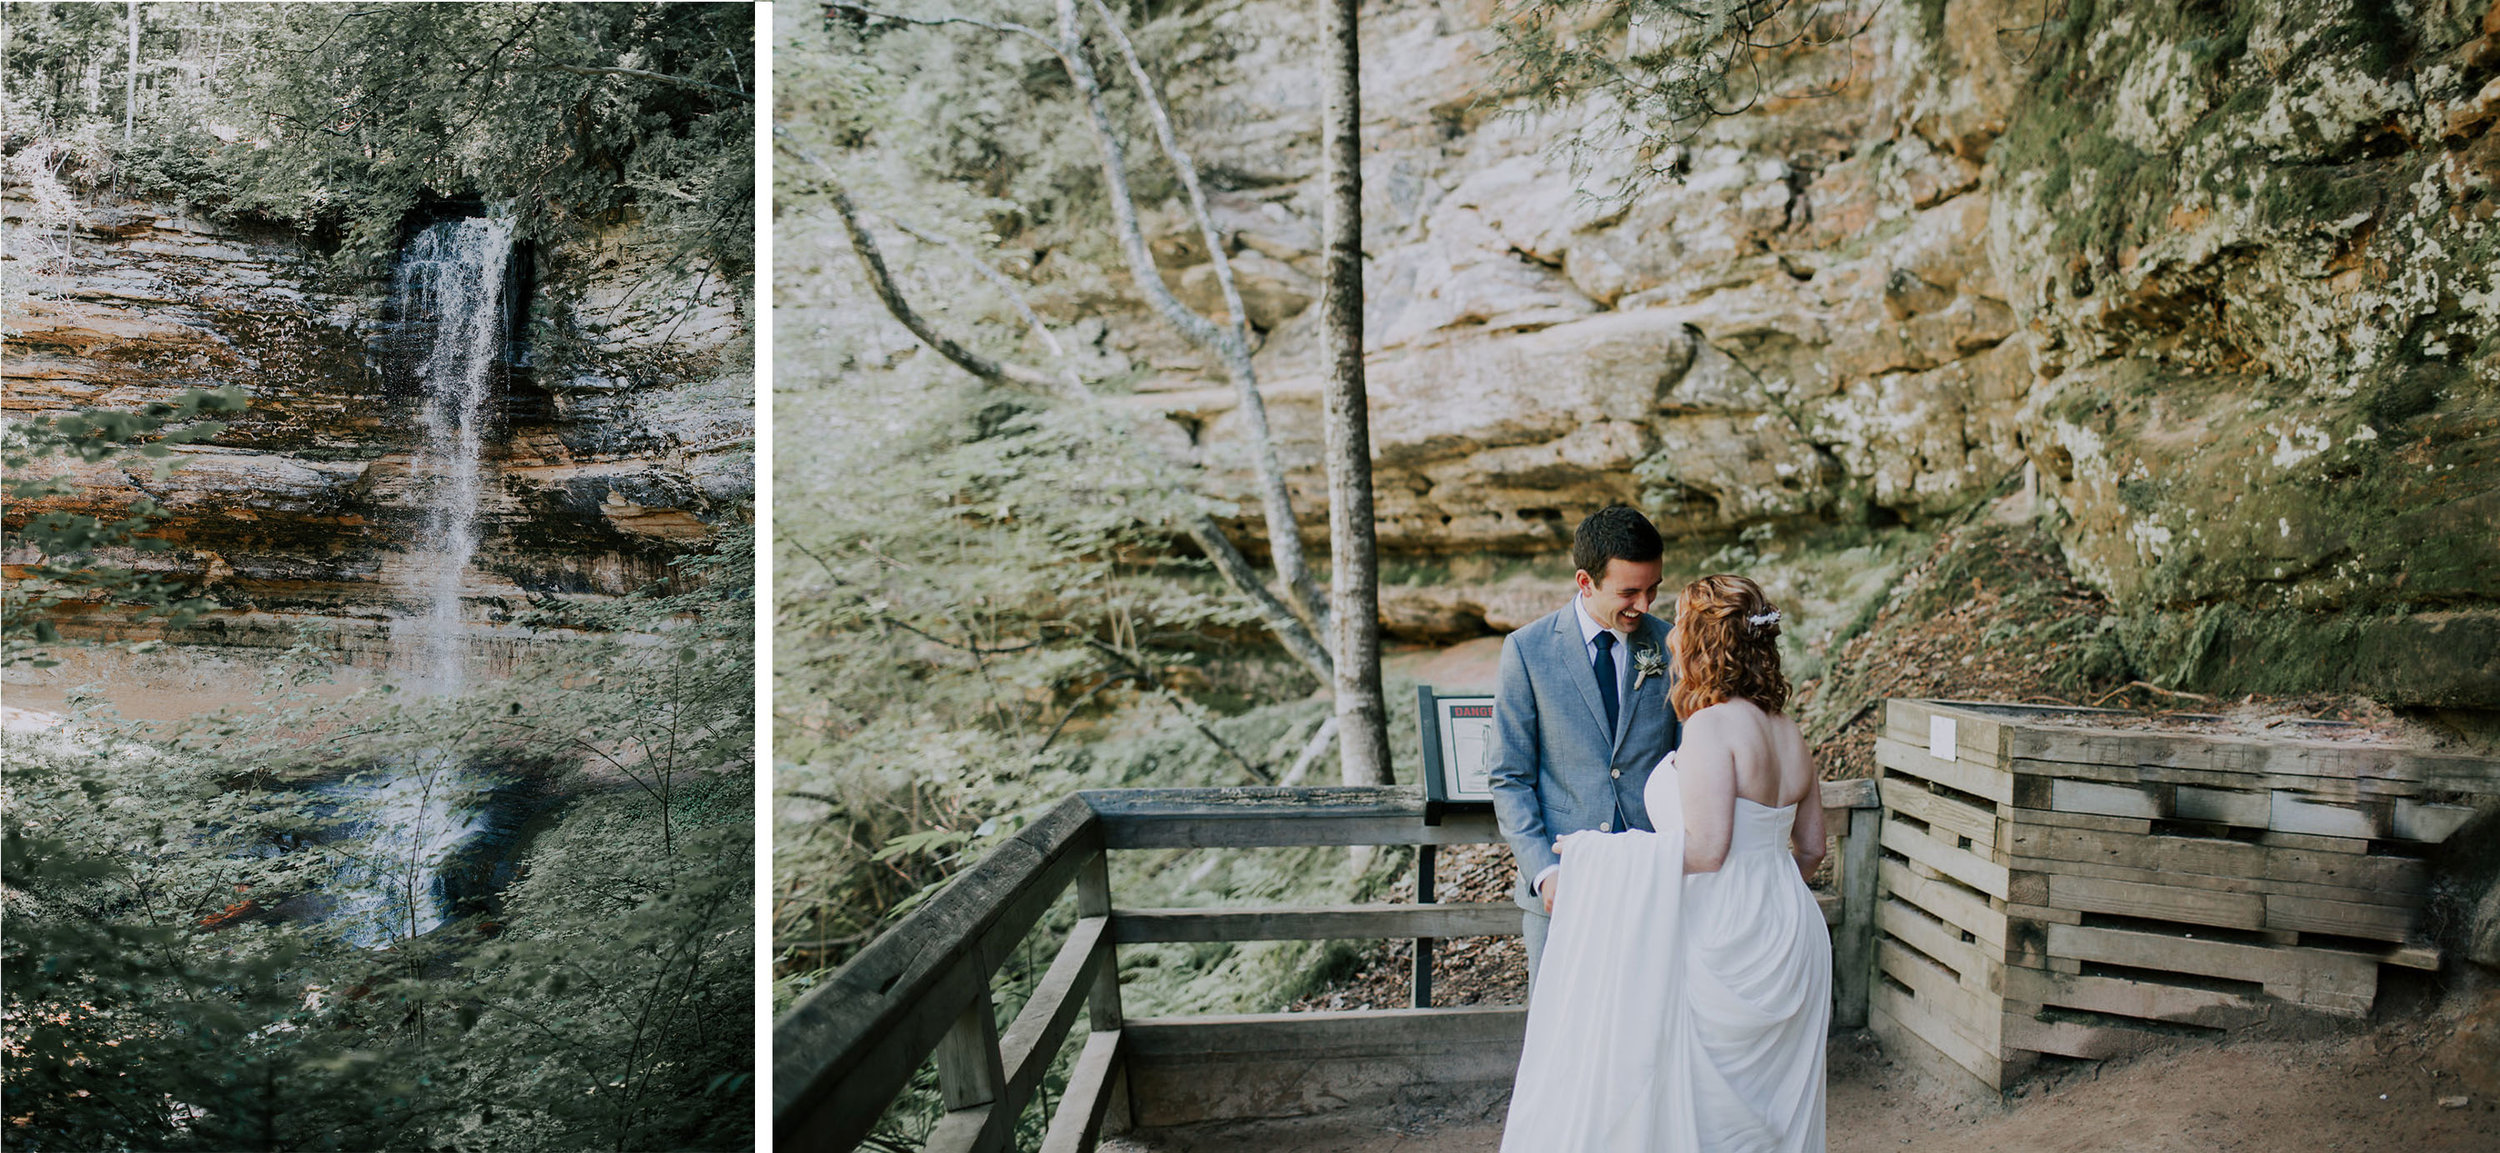 3 Carol Hannah Bridal Citrine Gown Katie Multi 1.jpg